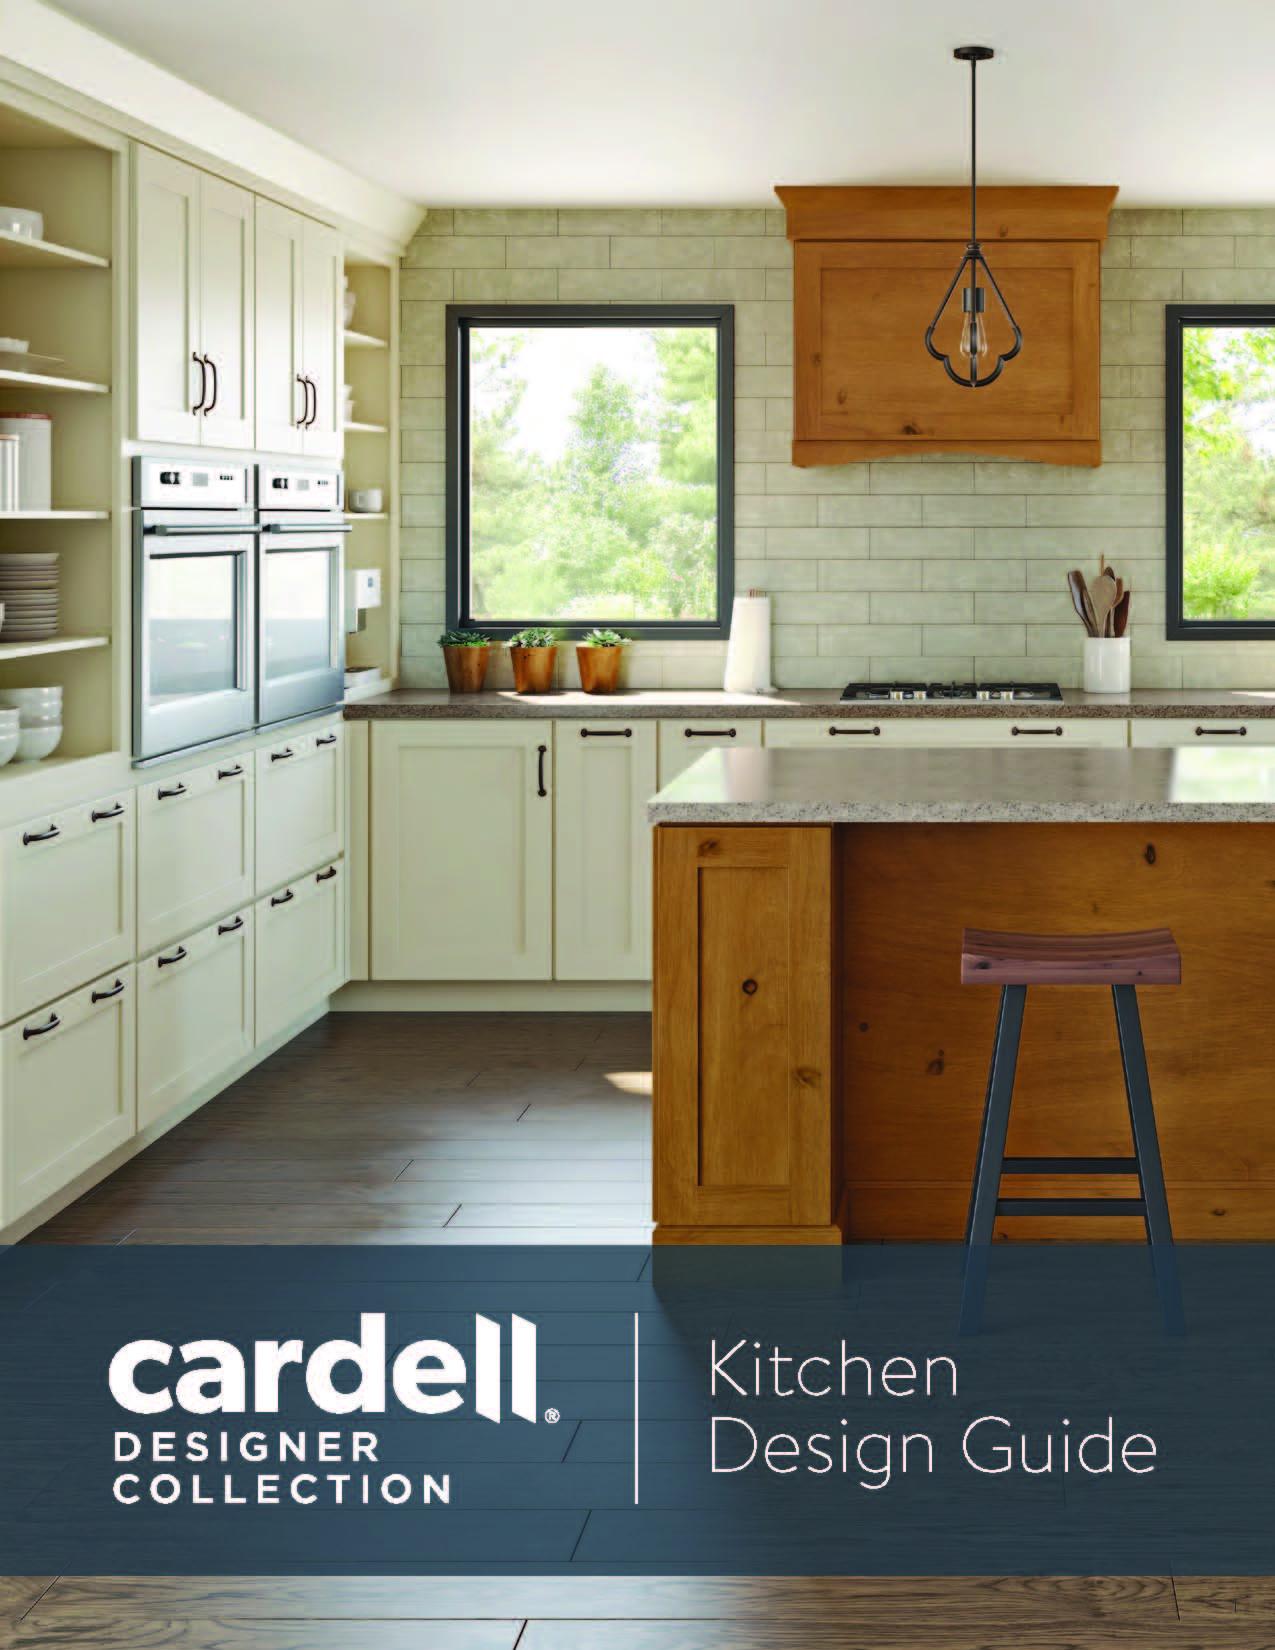 cardell-designer-collection-brochure-cover-2021.jpg